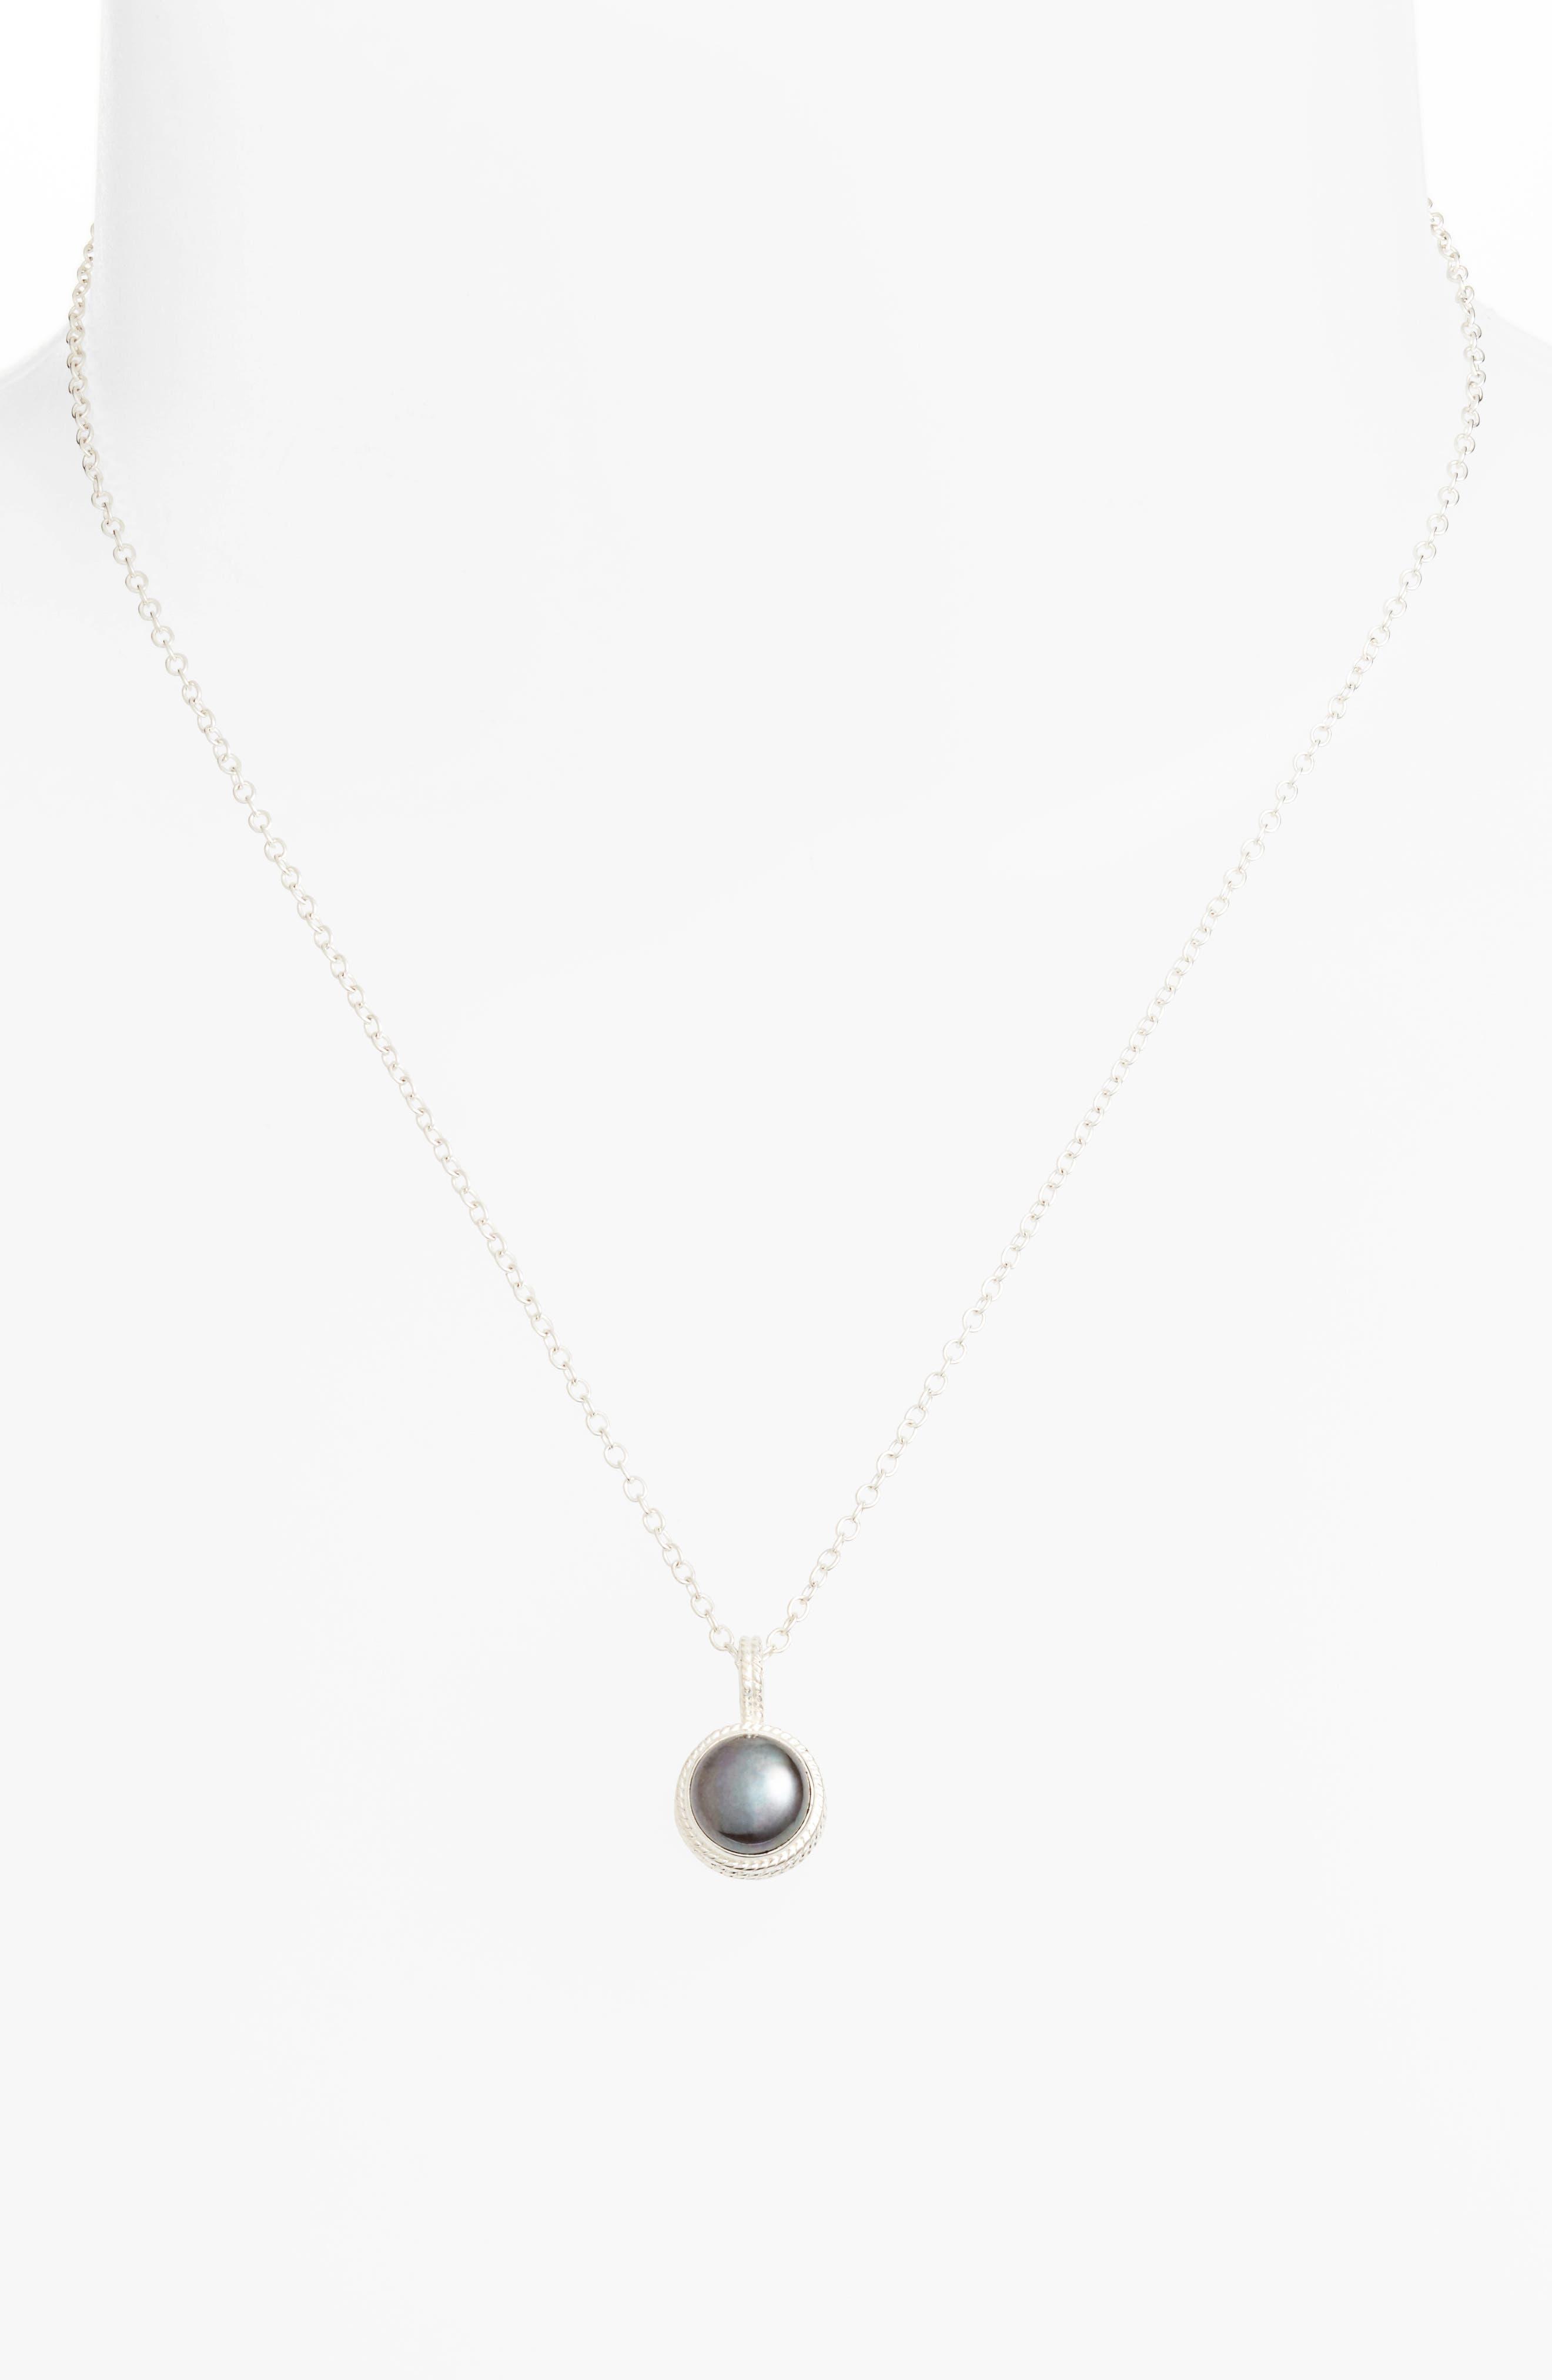 Genuine Blue Pearl Pendant Necklace,                             Alternate thumbnail 2, color,                             Silver/ Blue Pearl